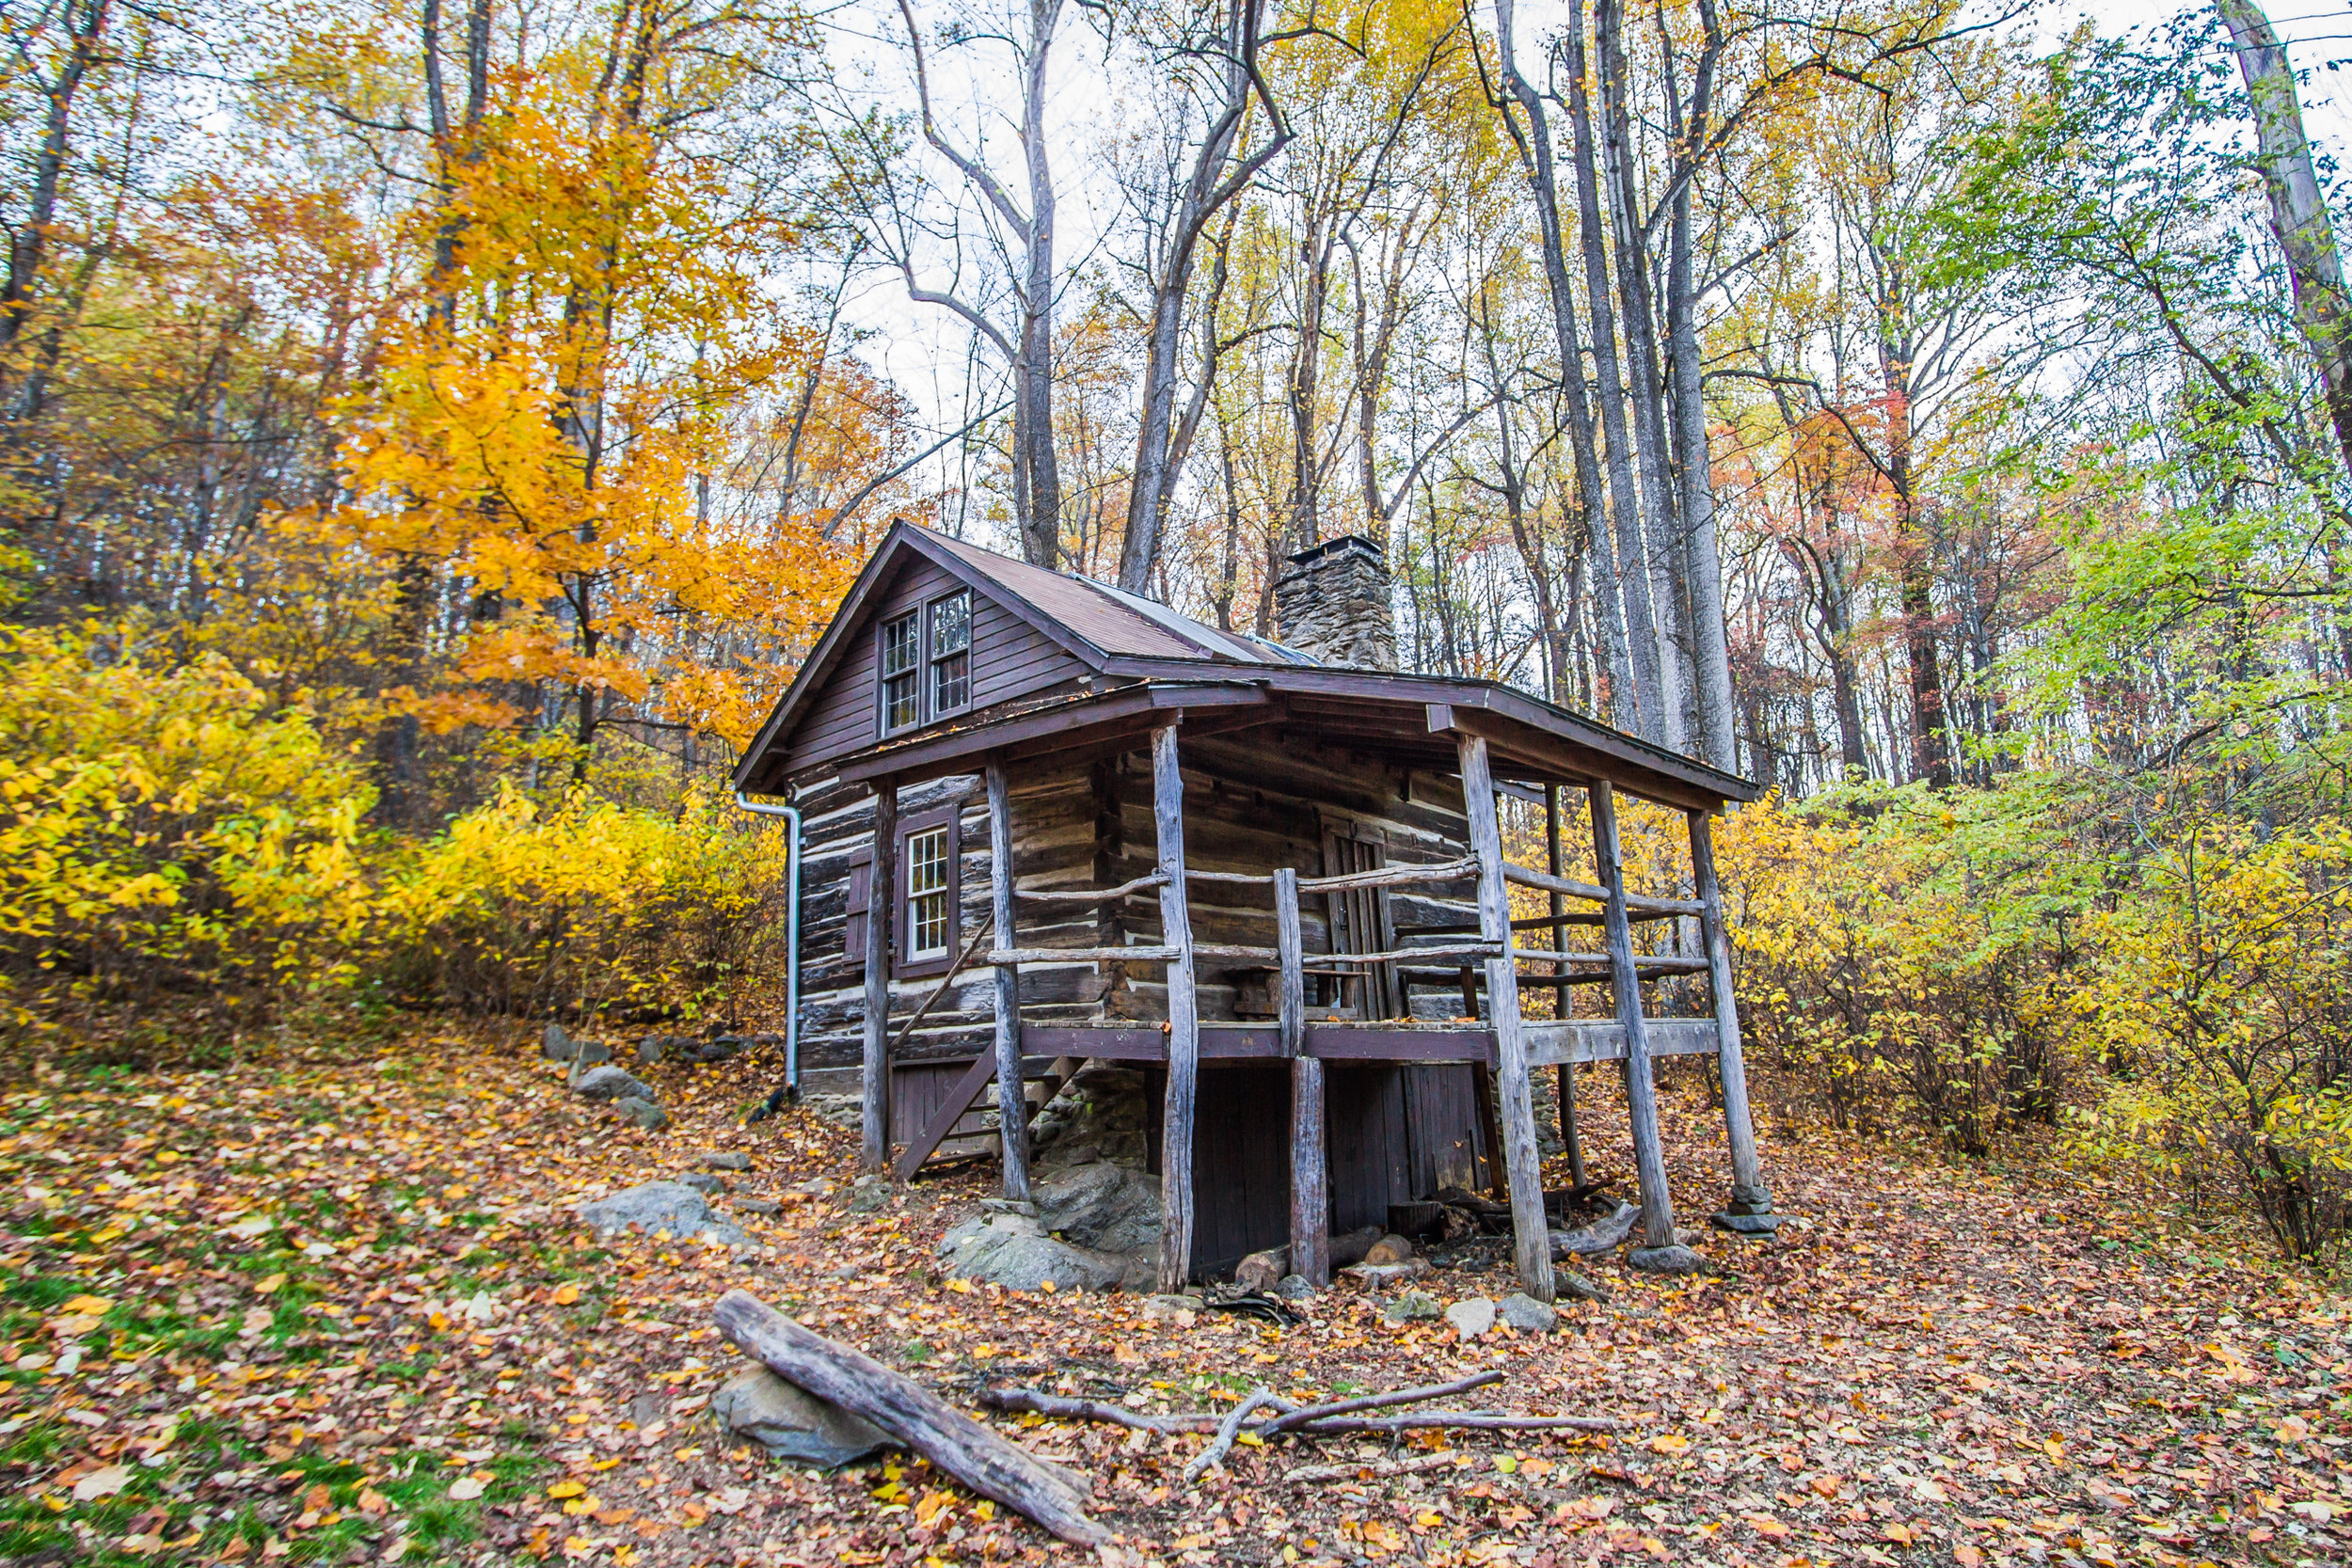 Jones Mountain cabin, Shenandoah, Virginia